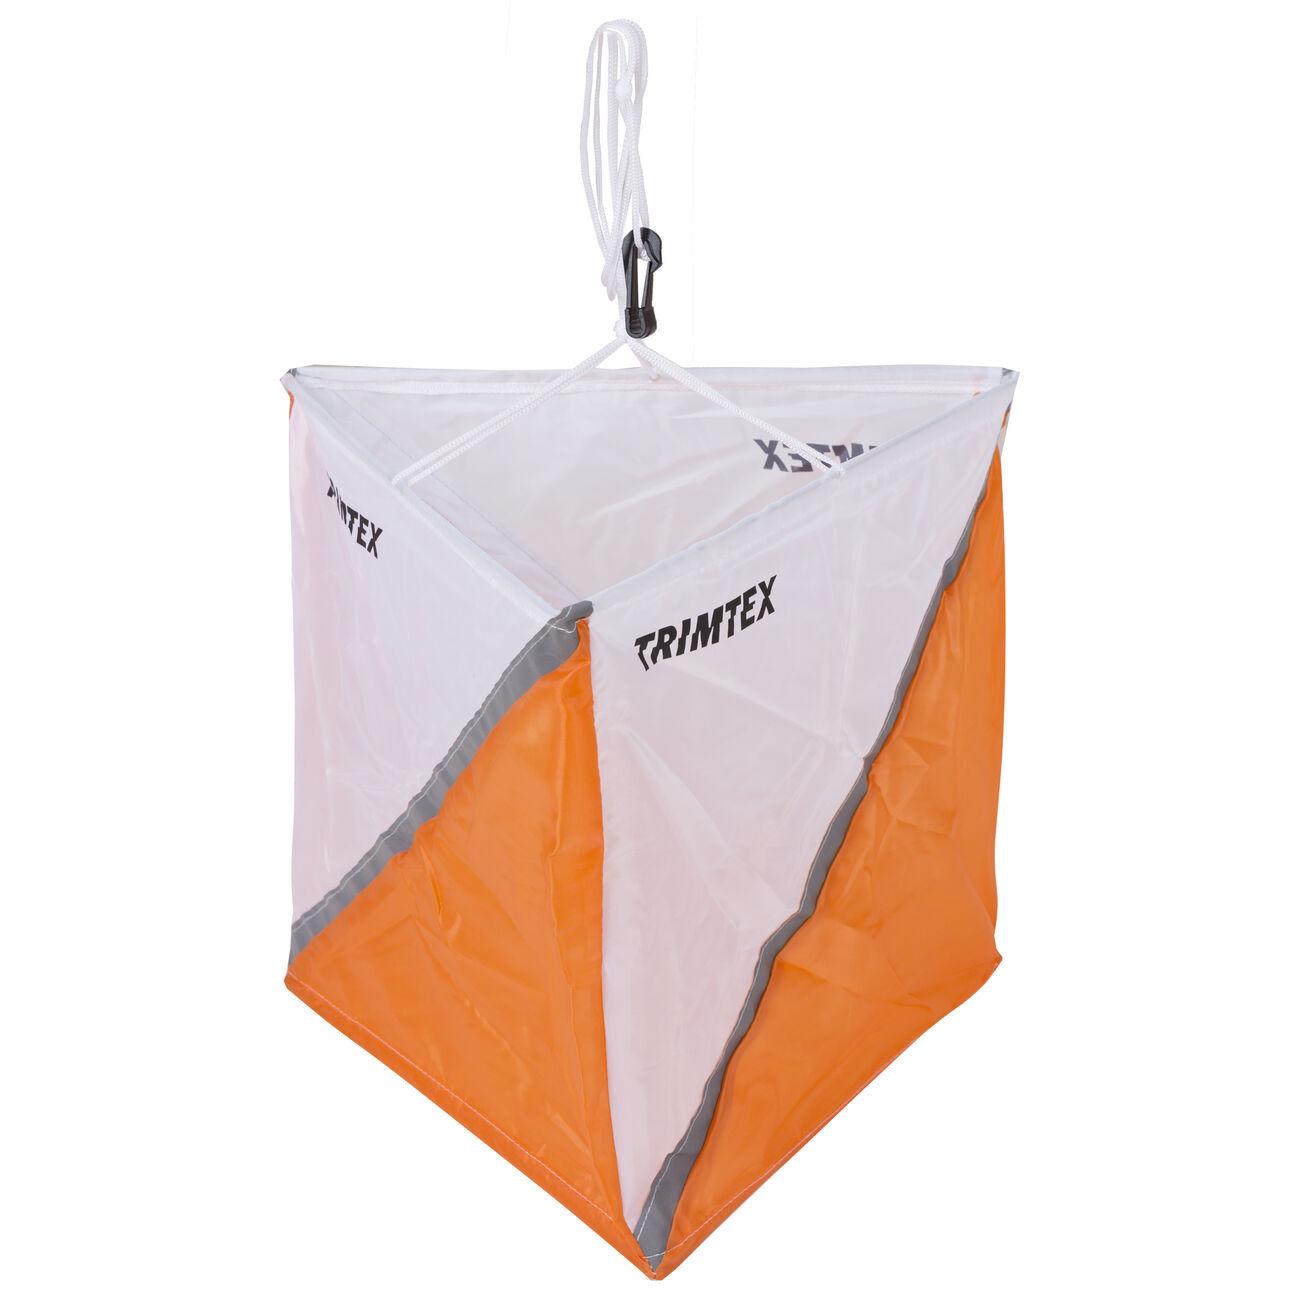 Postskjerm med refleks til konkurranse i orientering 10-pakning